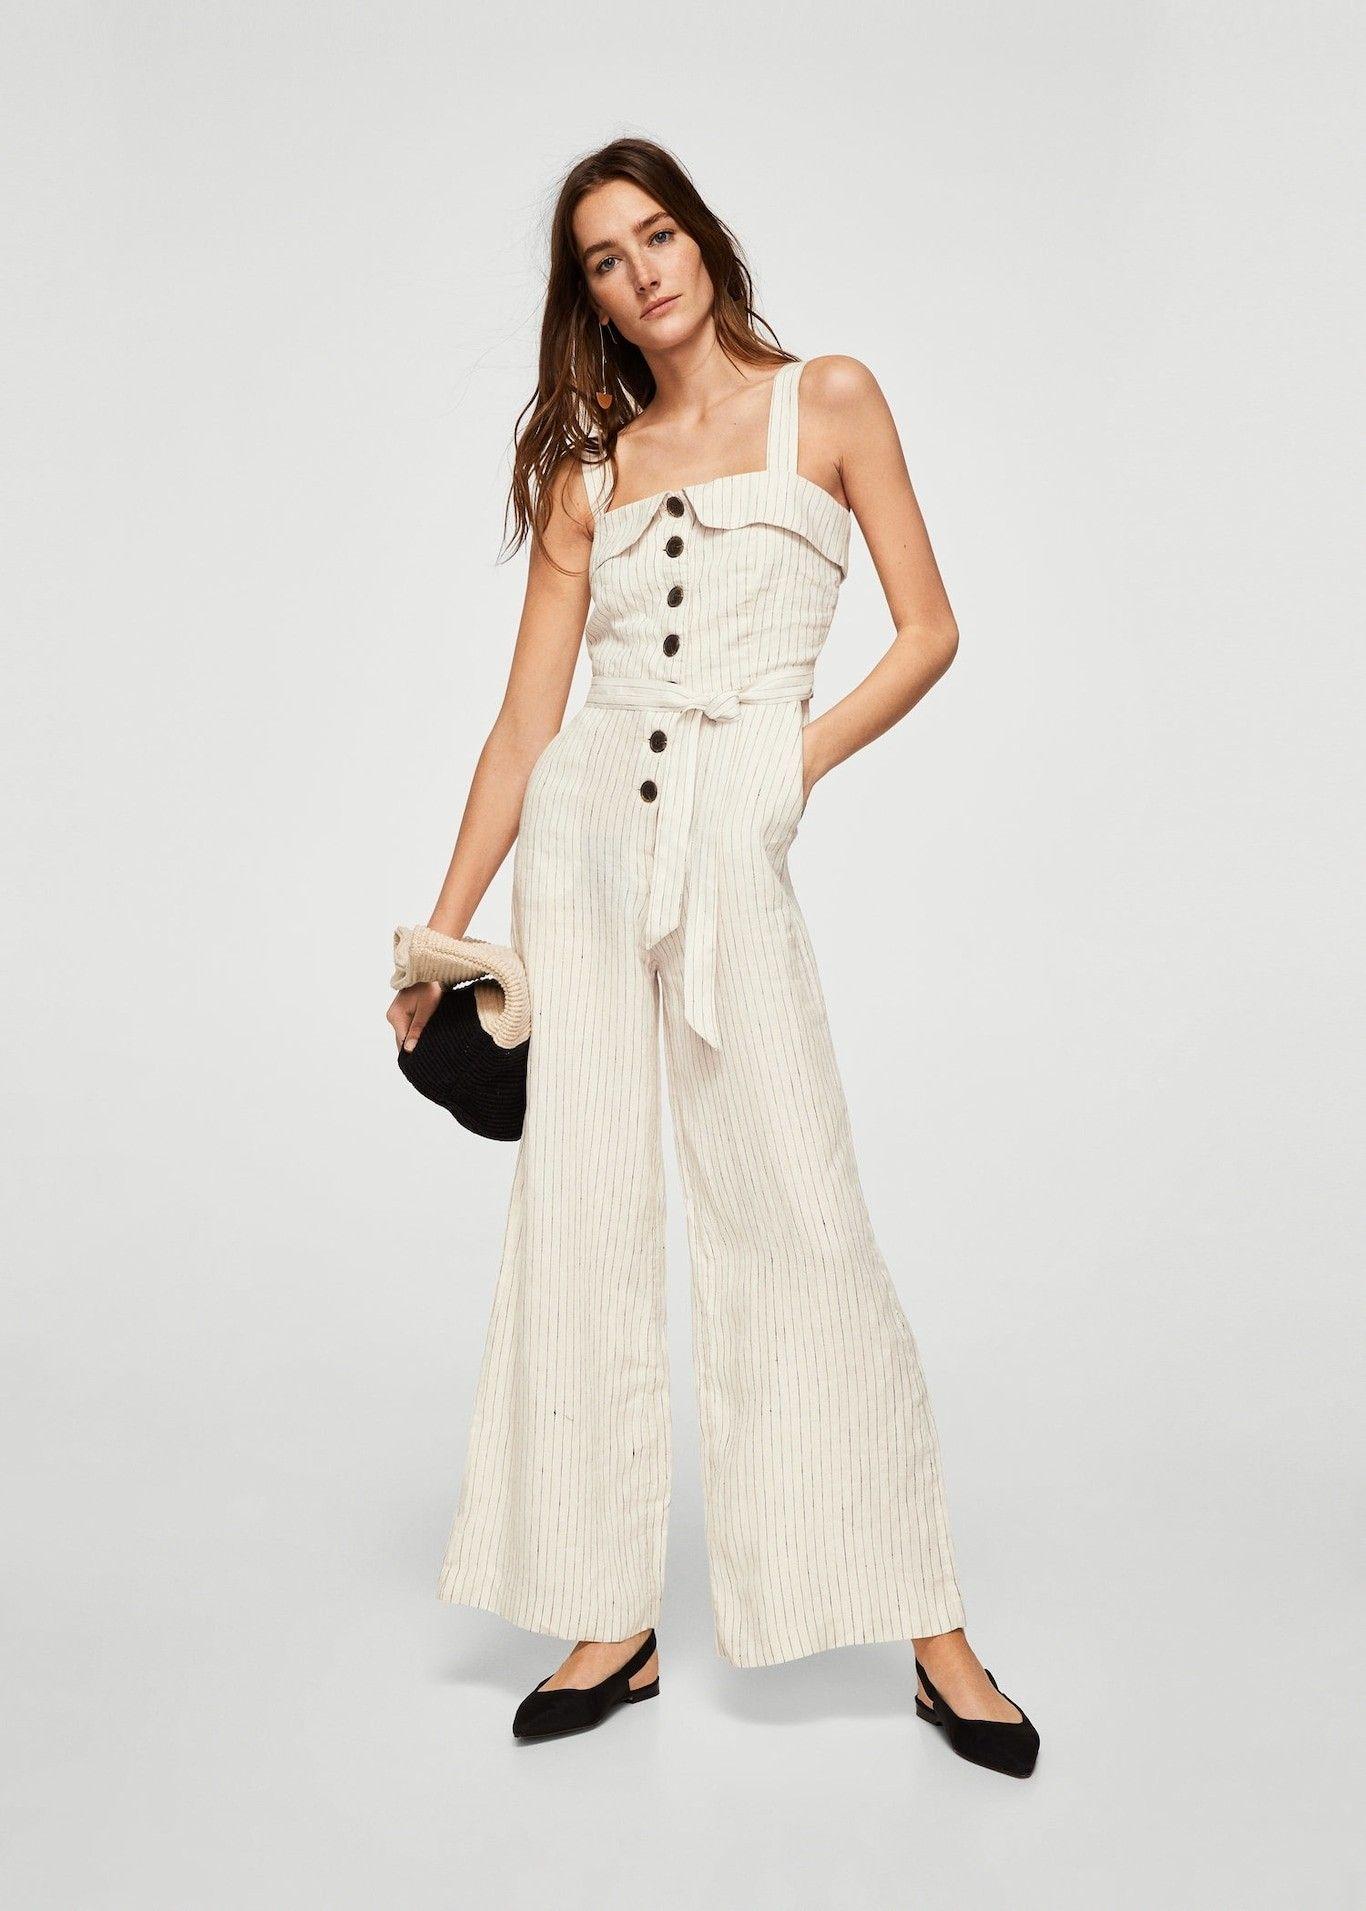 4e9a3b5005 Discover the latest trends in Mango fashion